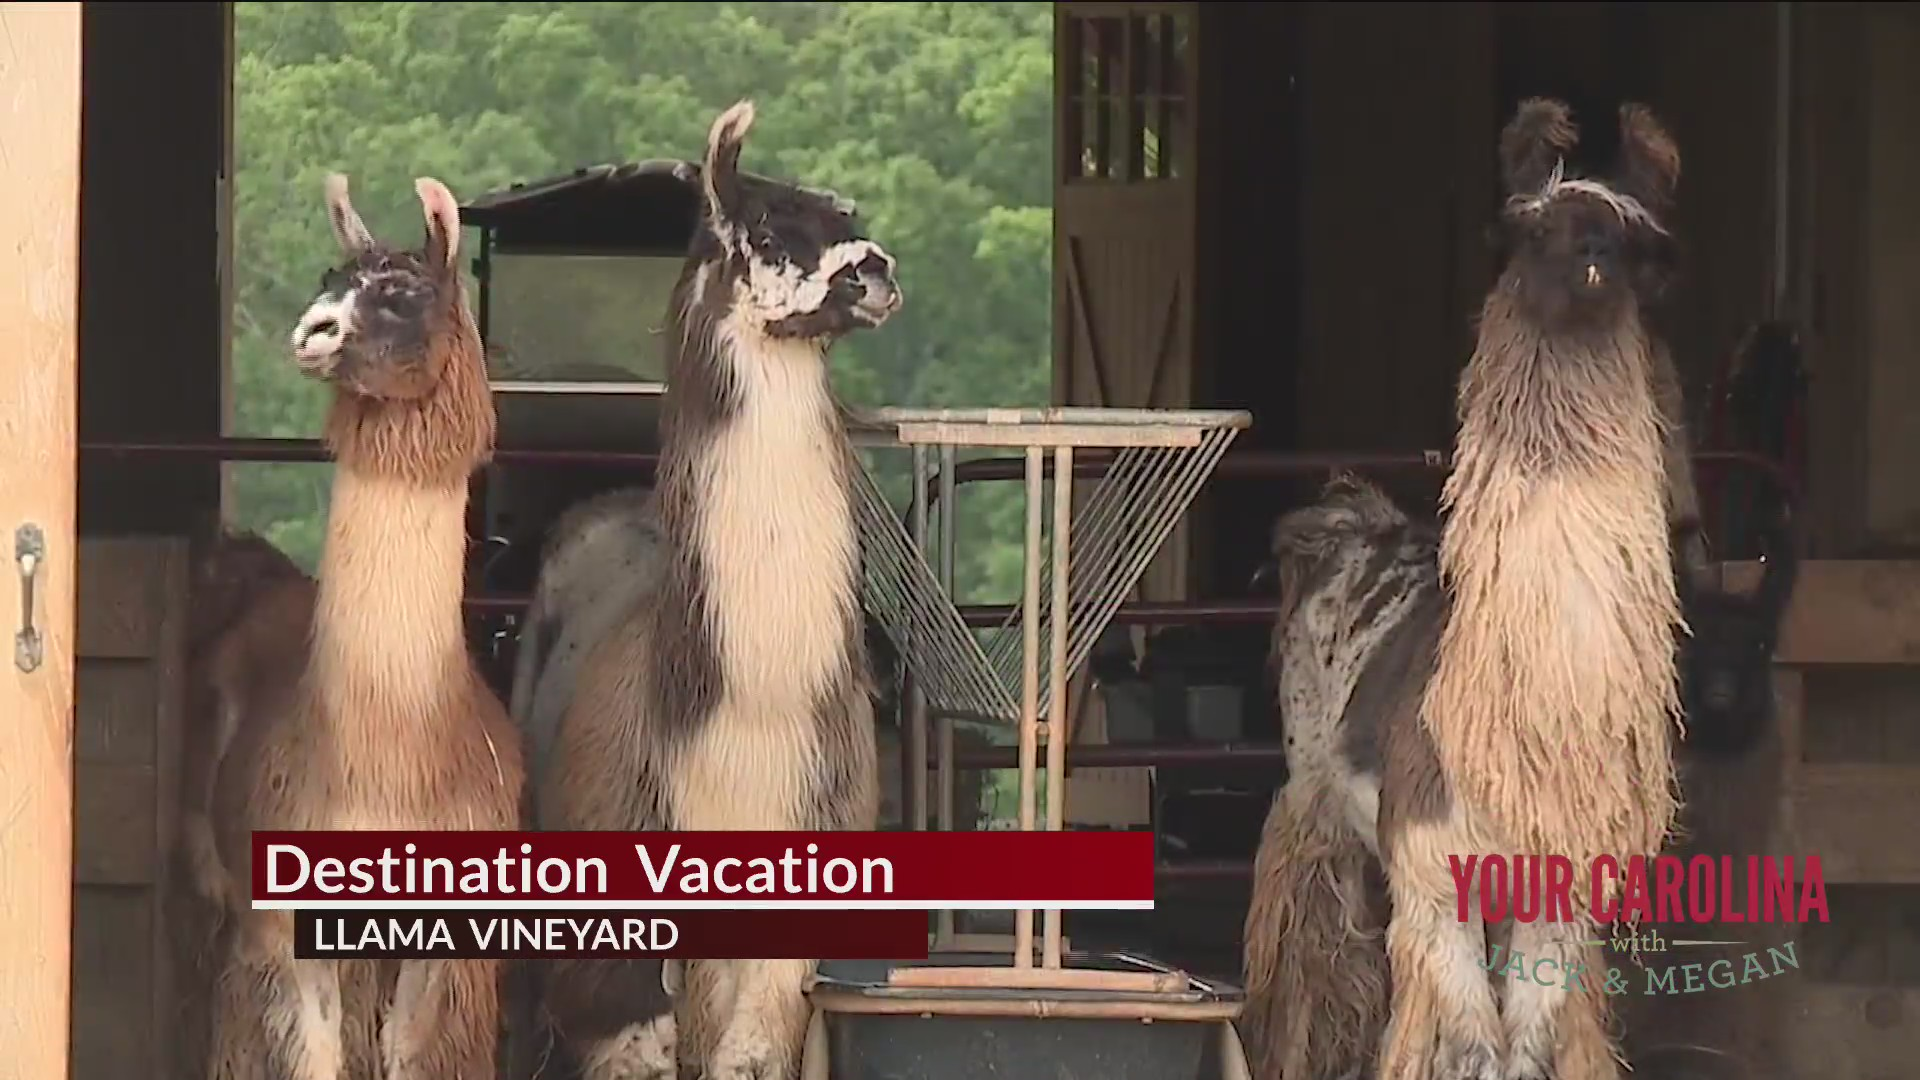 Destination Vacation - Llama Vineyard